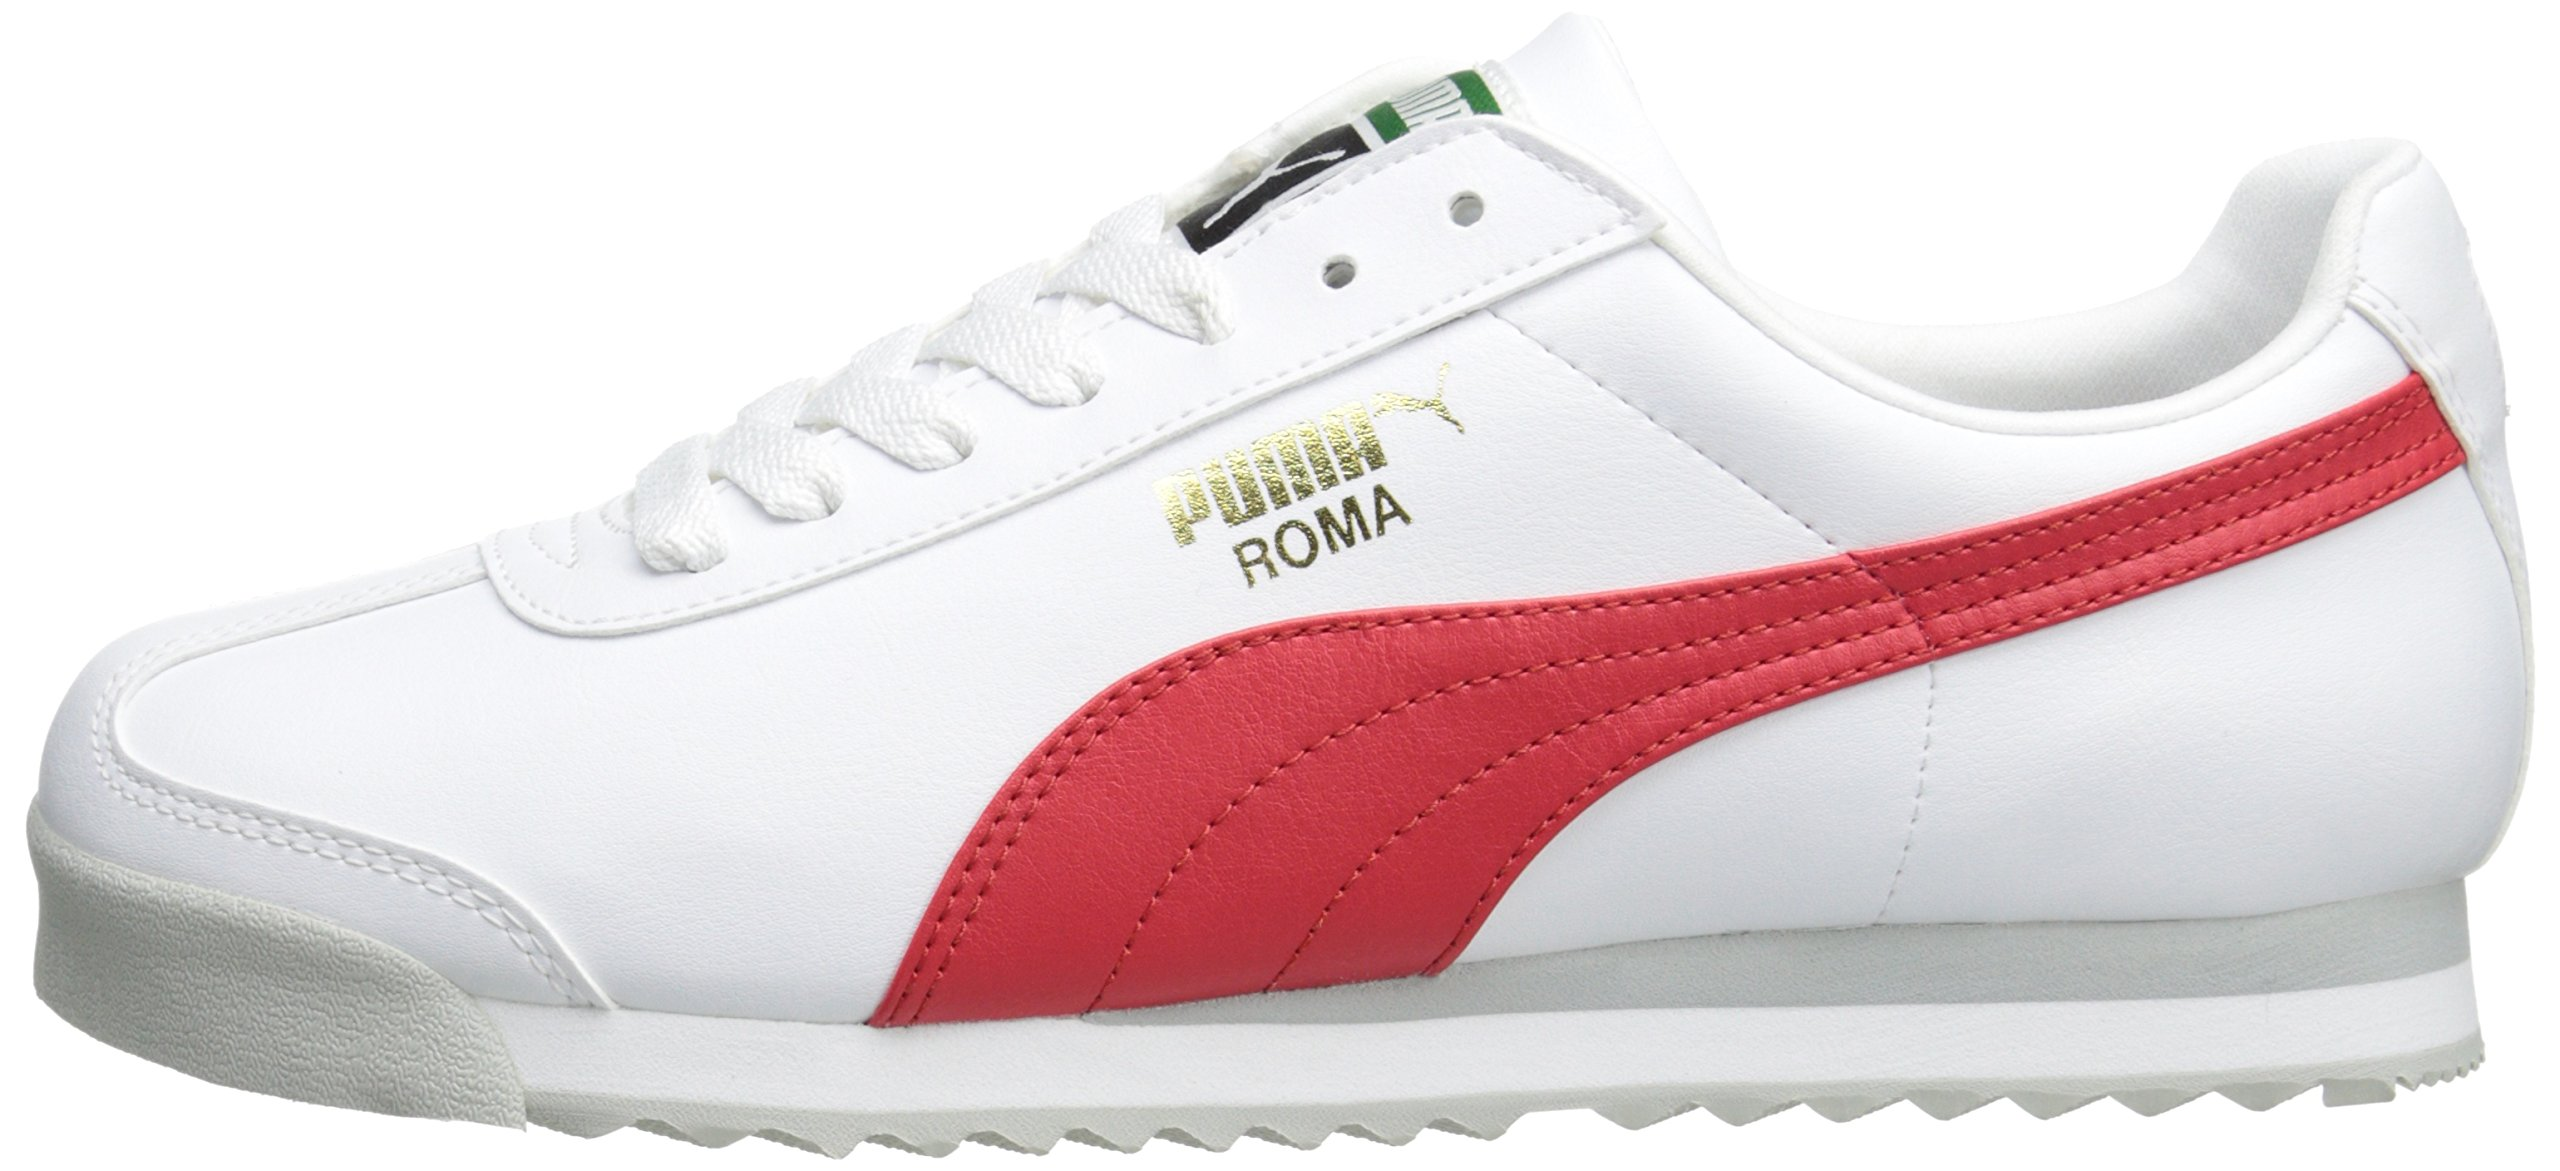 PUMA Men's Roma Basic Fashion Sneaker, White/High Risk Red/White - 9 D(M) US by PUMA (Image #5)